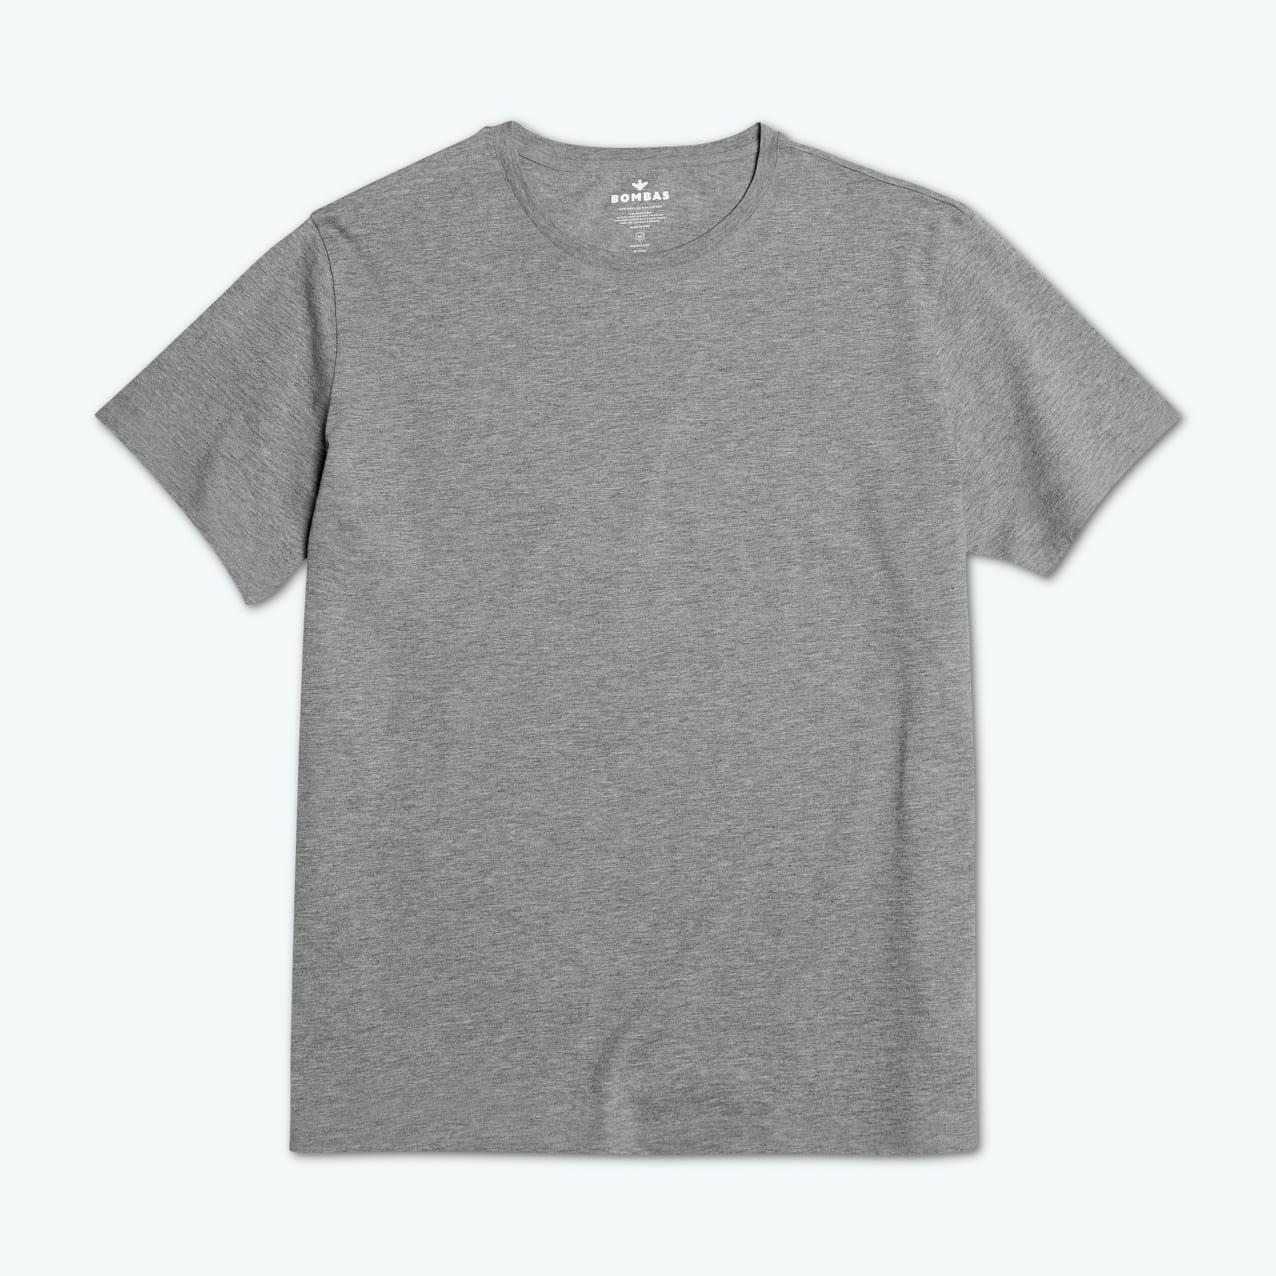 Bombas Pima Cotton T-Shirt